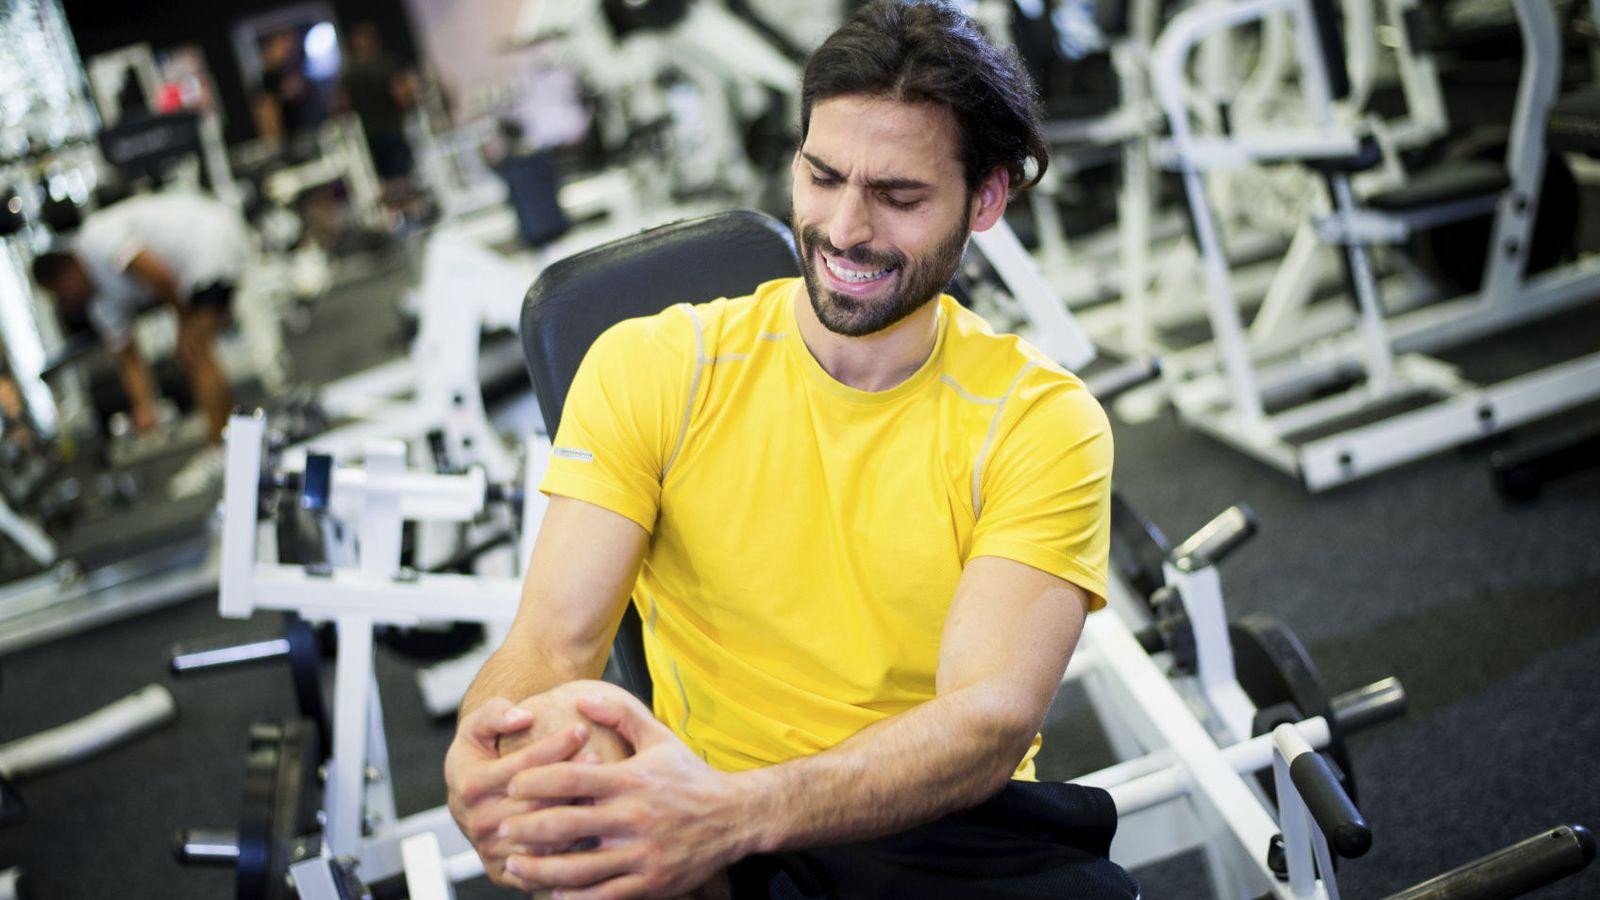 aparatos gymnasium artrosis